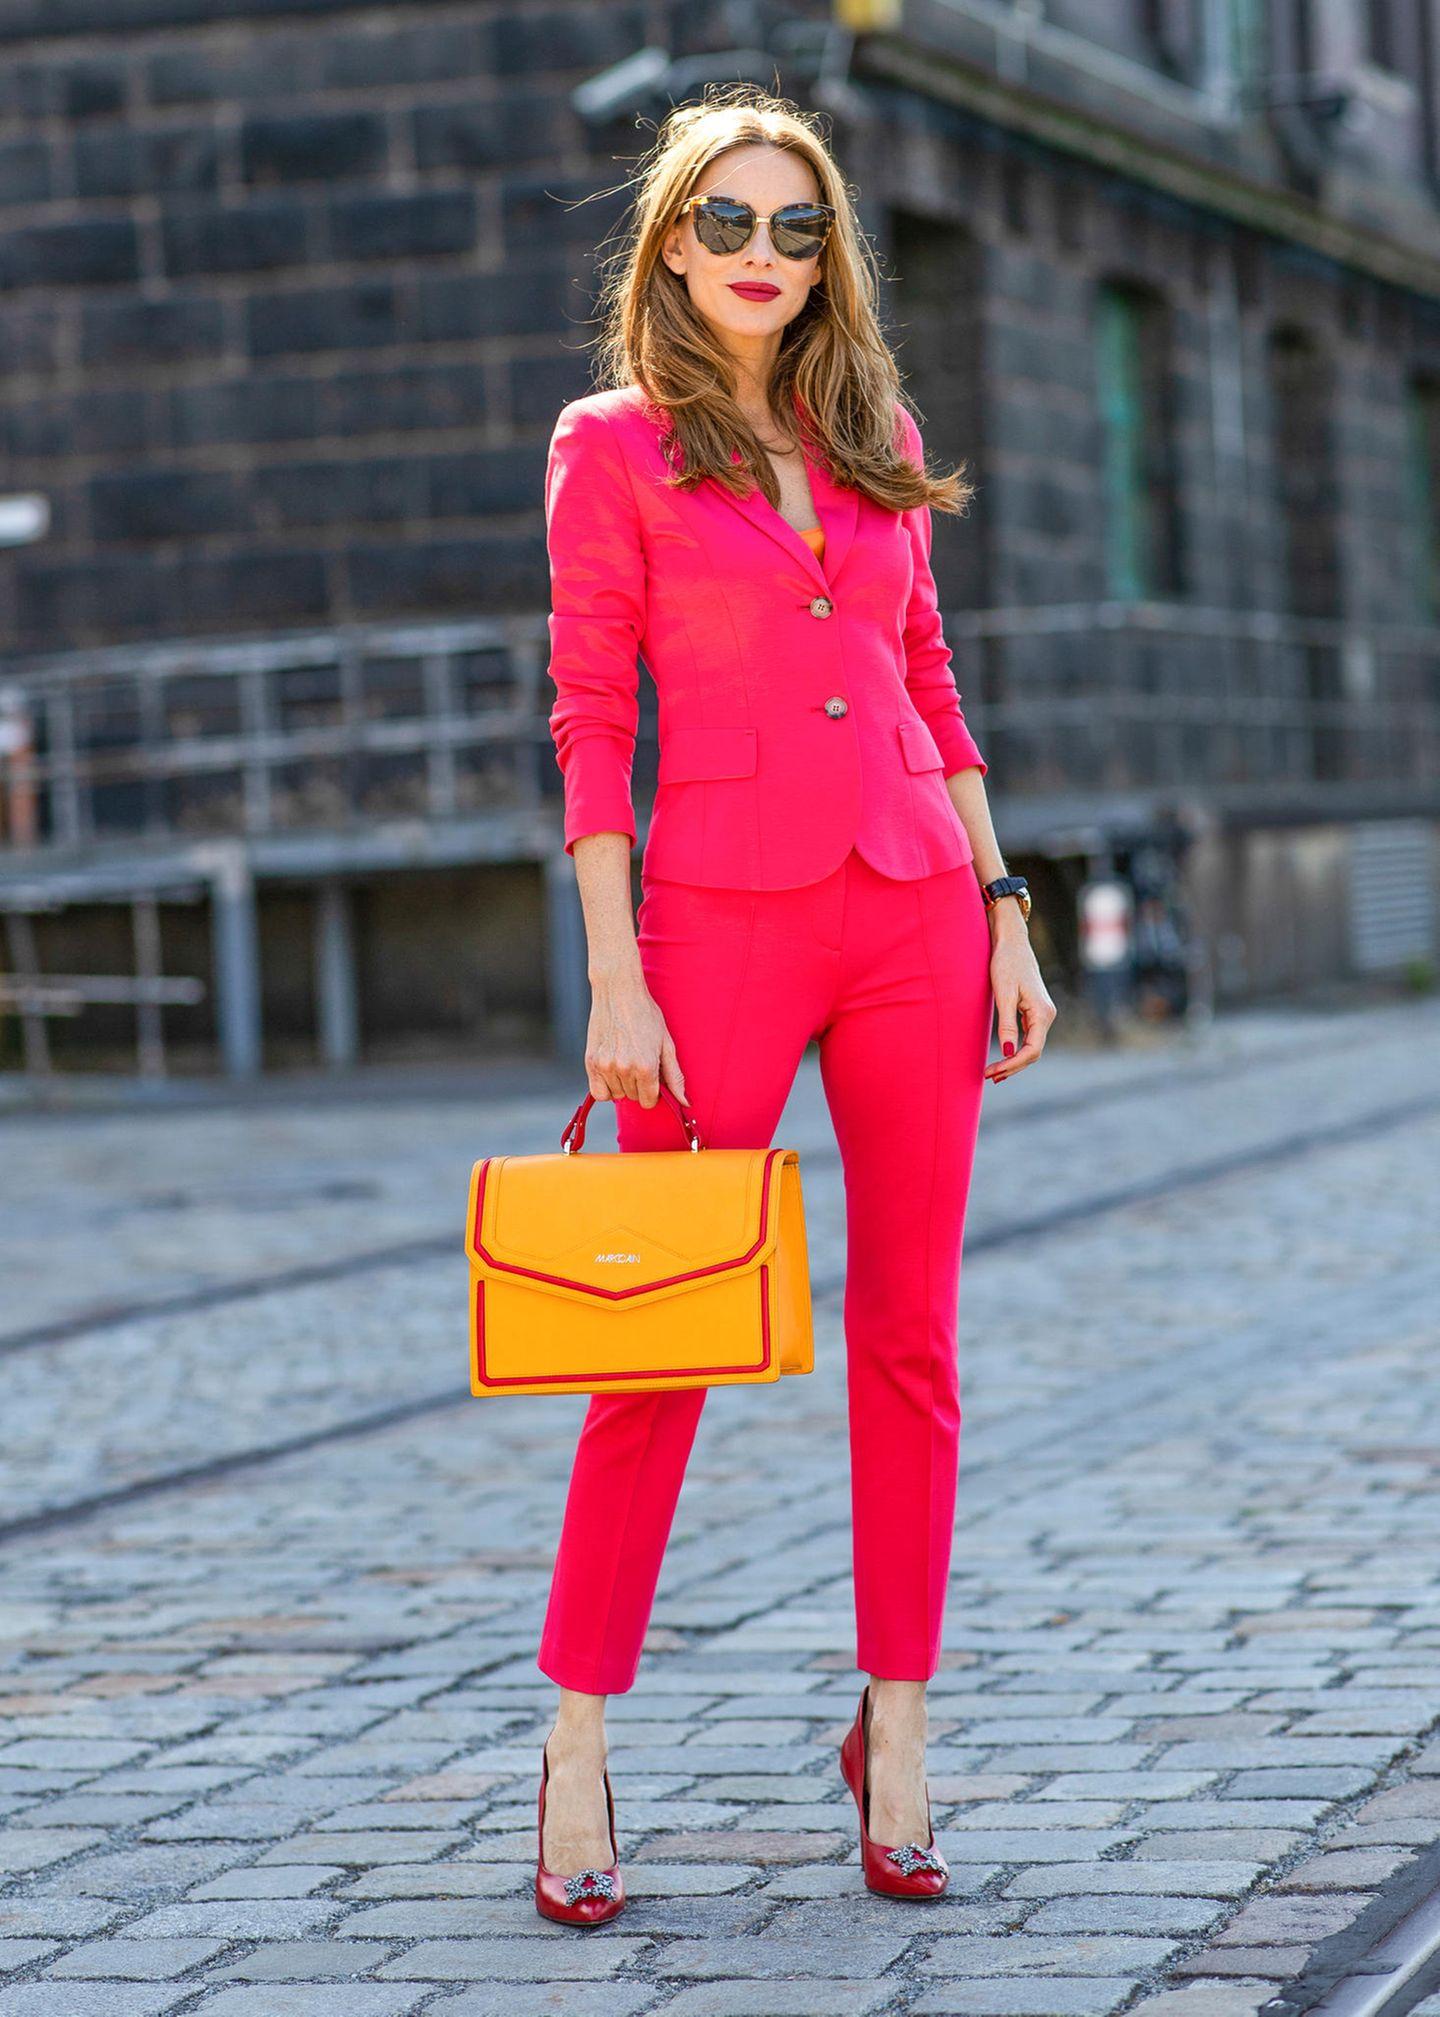 Streetstyles der Berliner Fashion Week: Alexandra Lapp